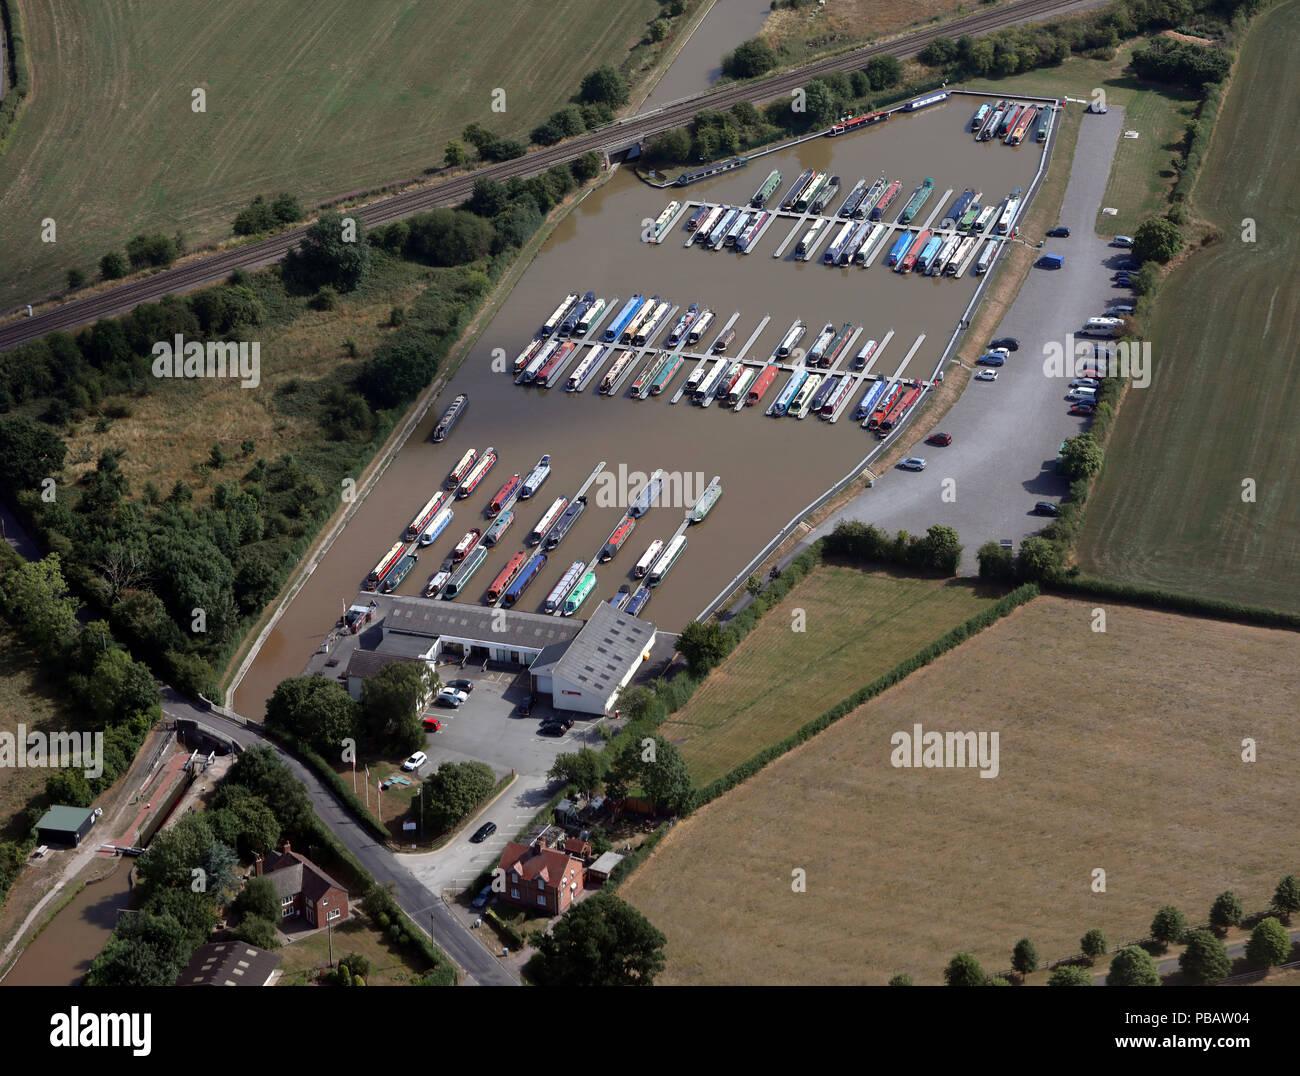 aerial view of Venetian Marina near Nantwich, Cheshire - Stock Image